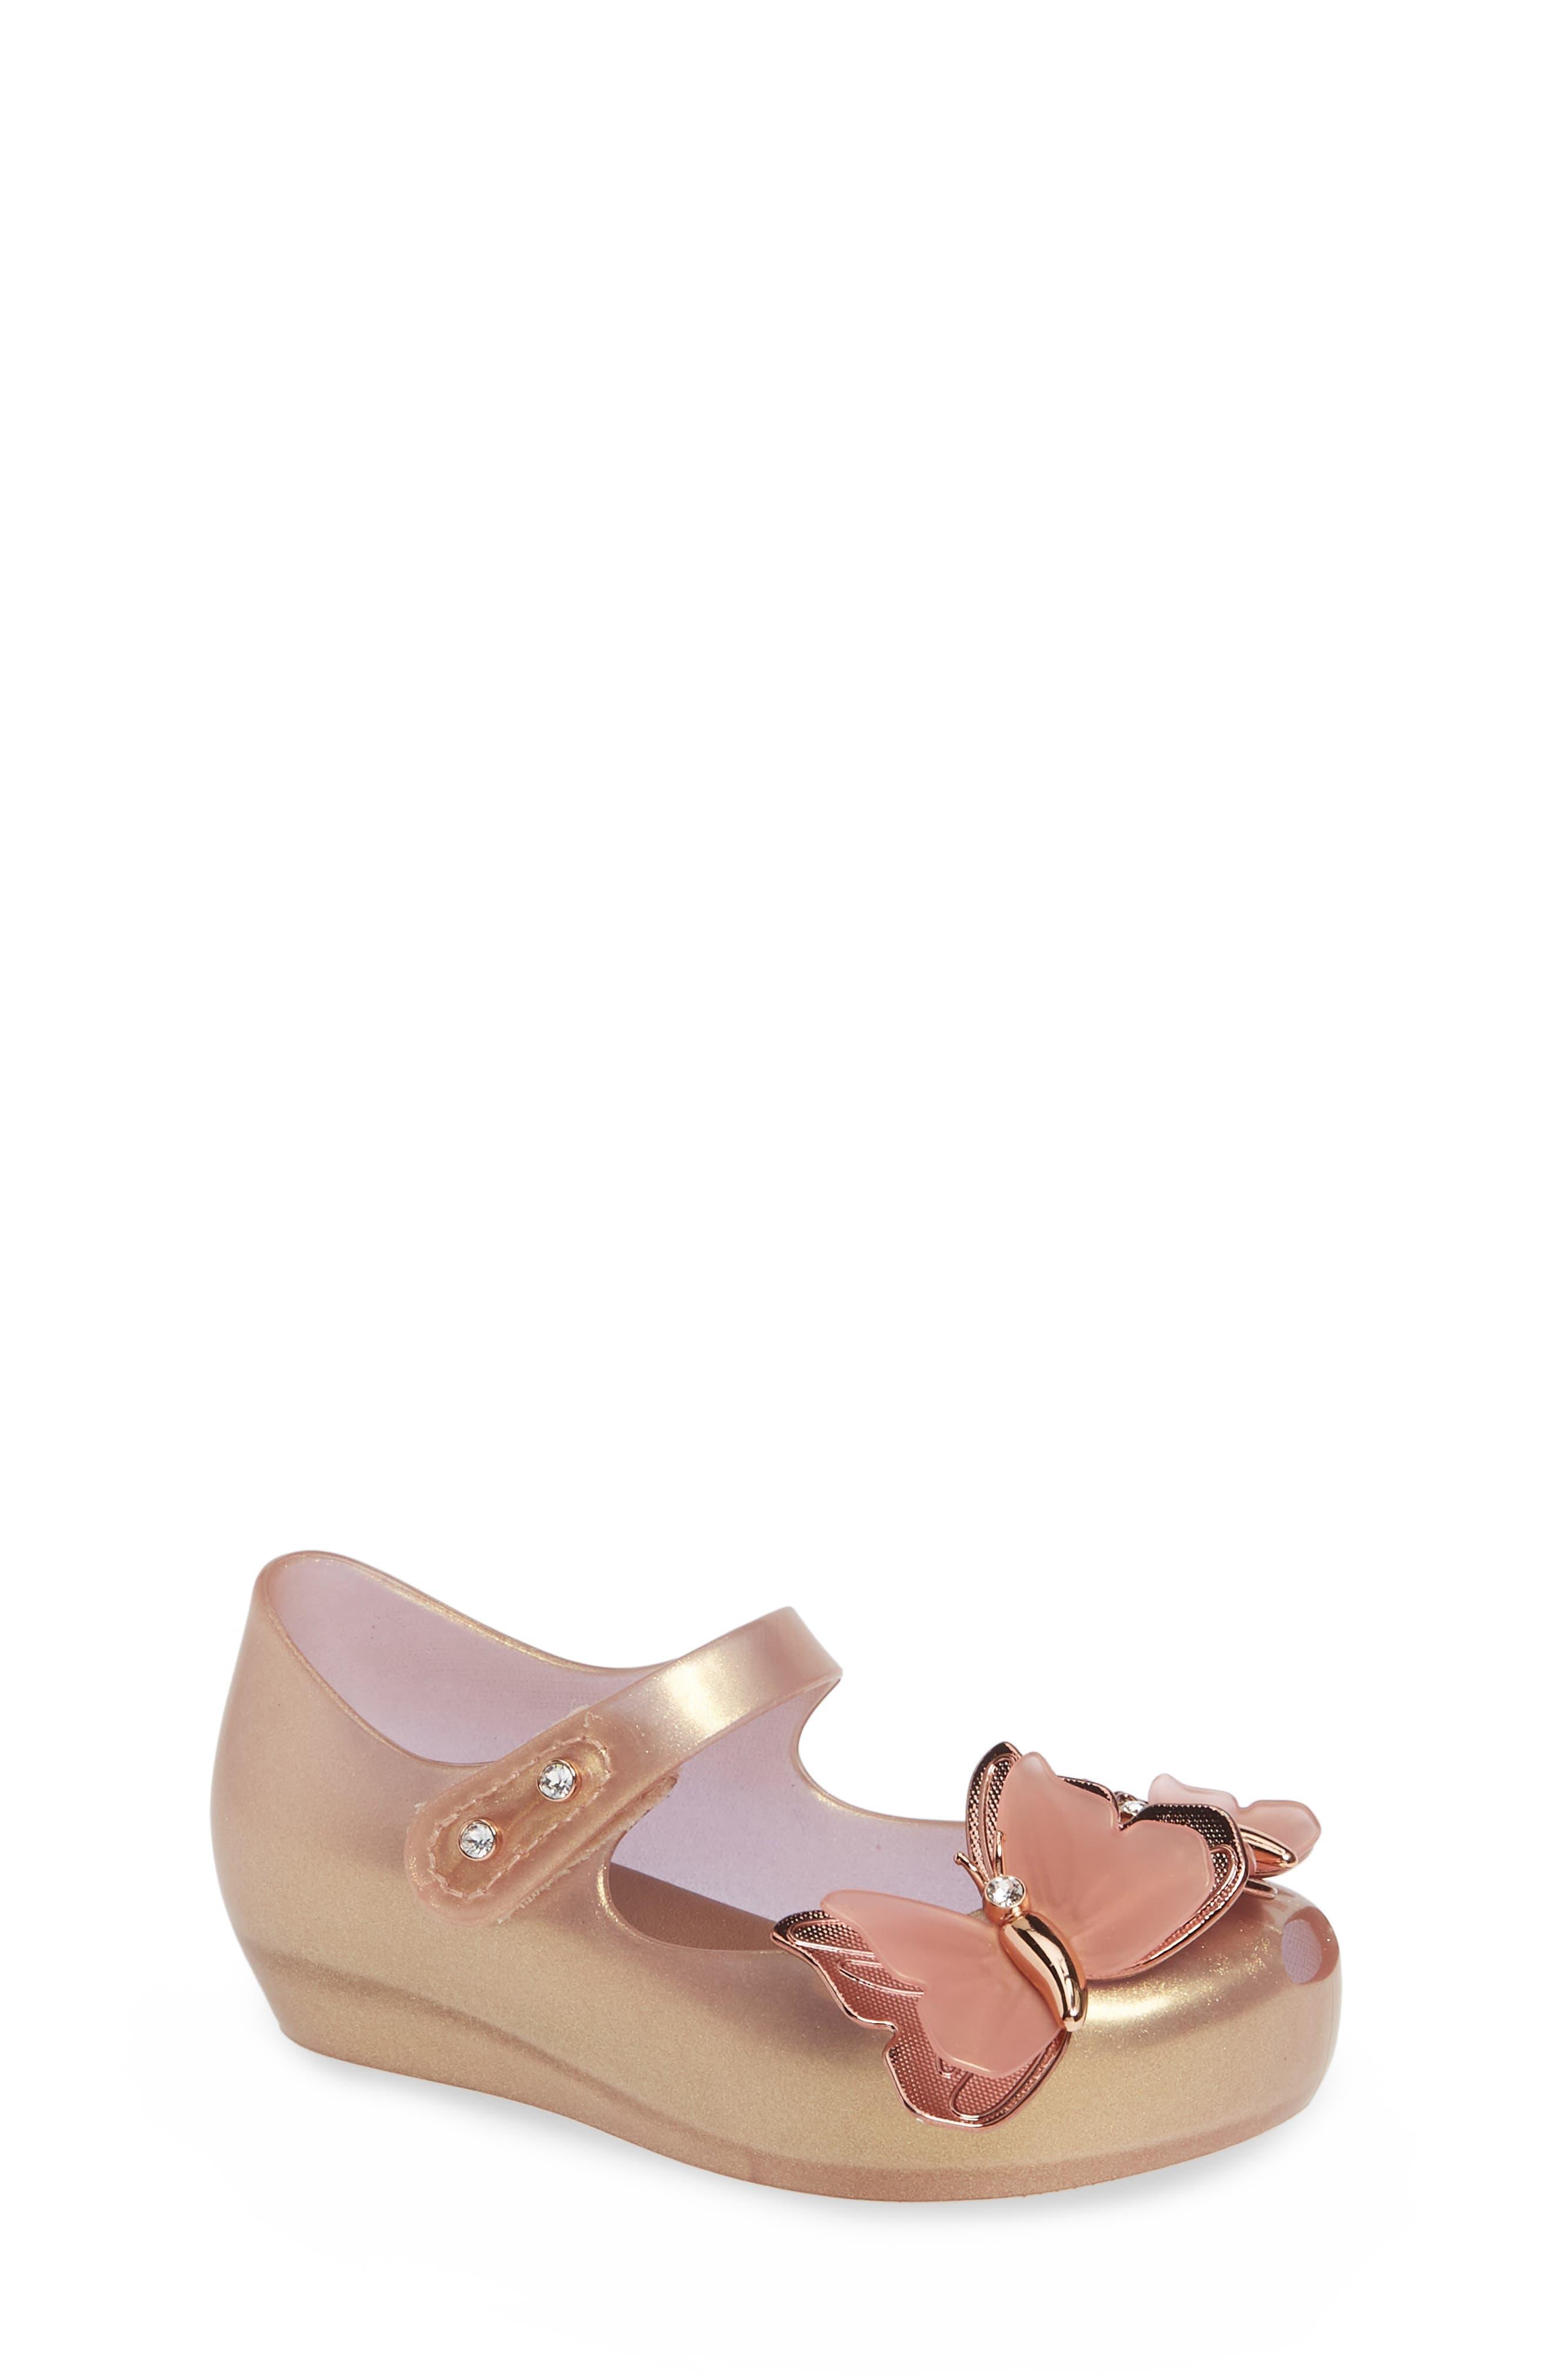 304ccf97b866 Mini Melissa Kids  Shoes